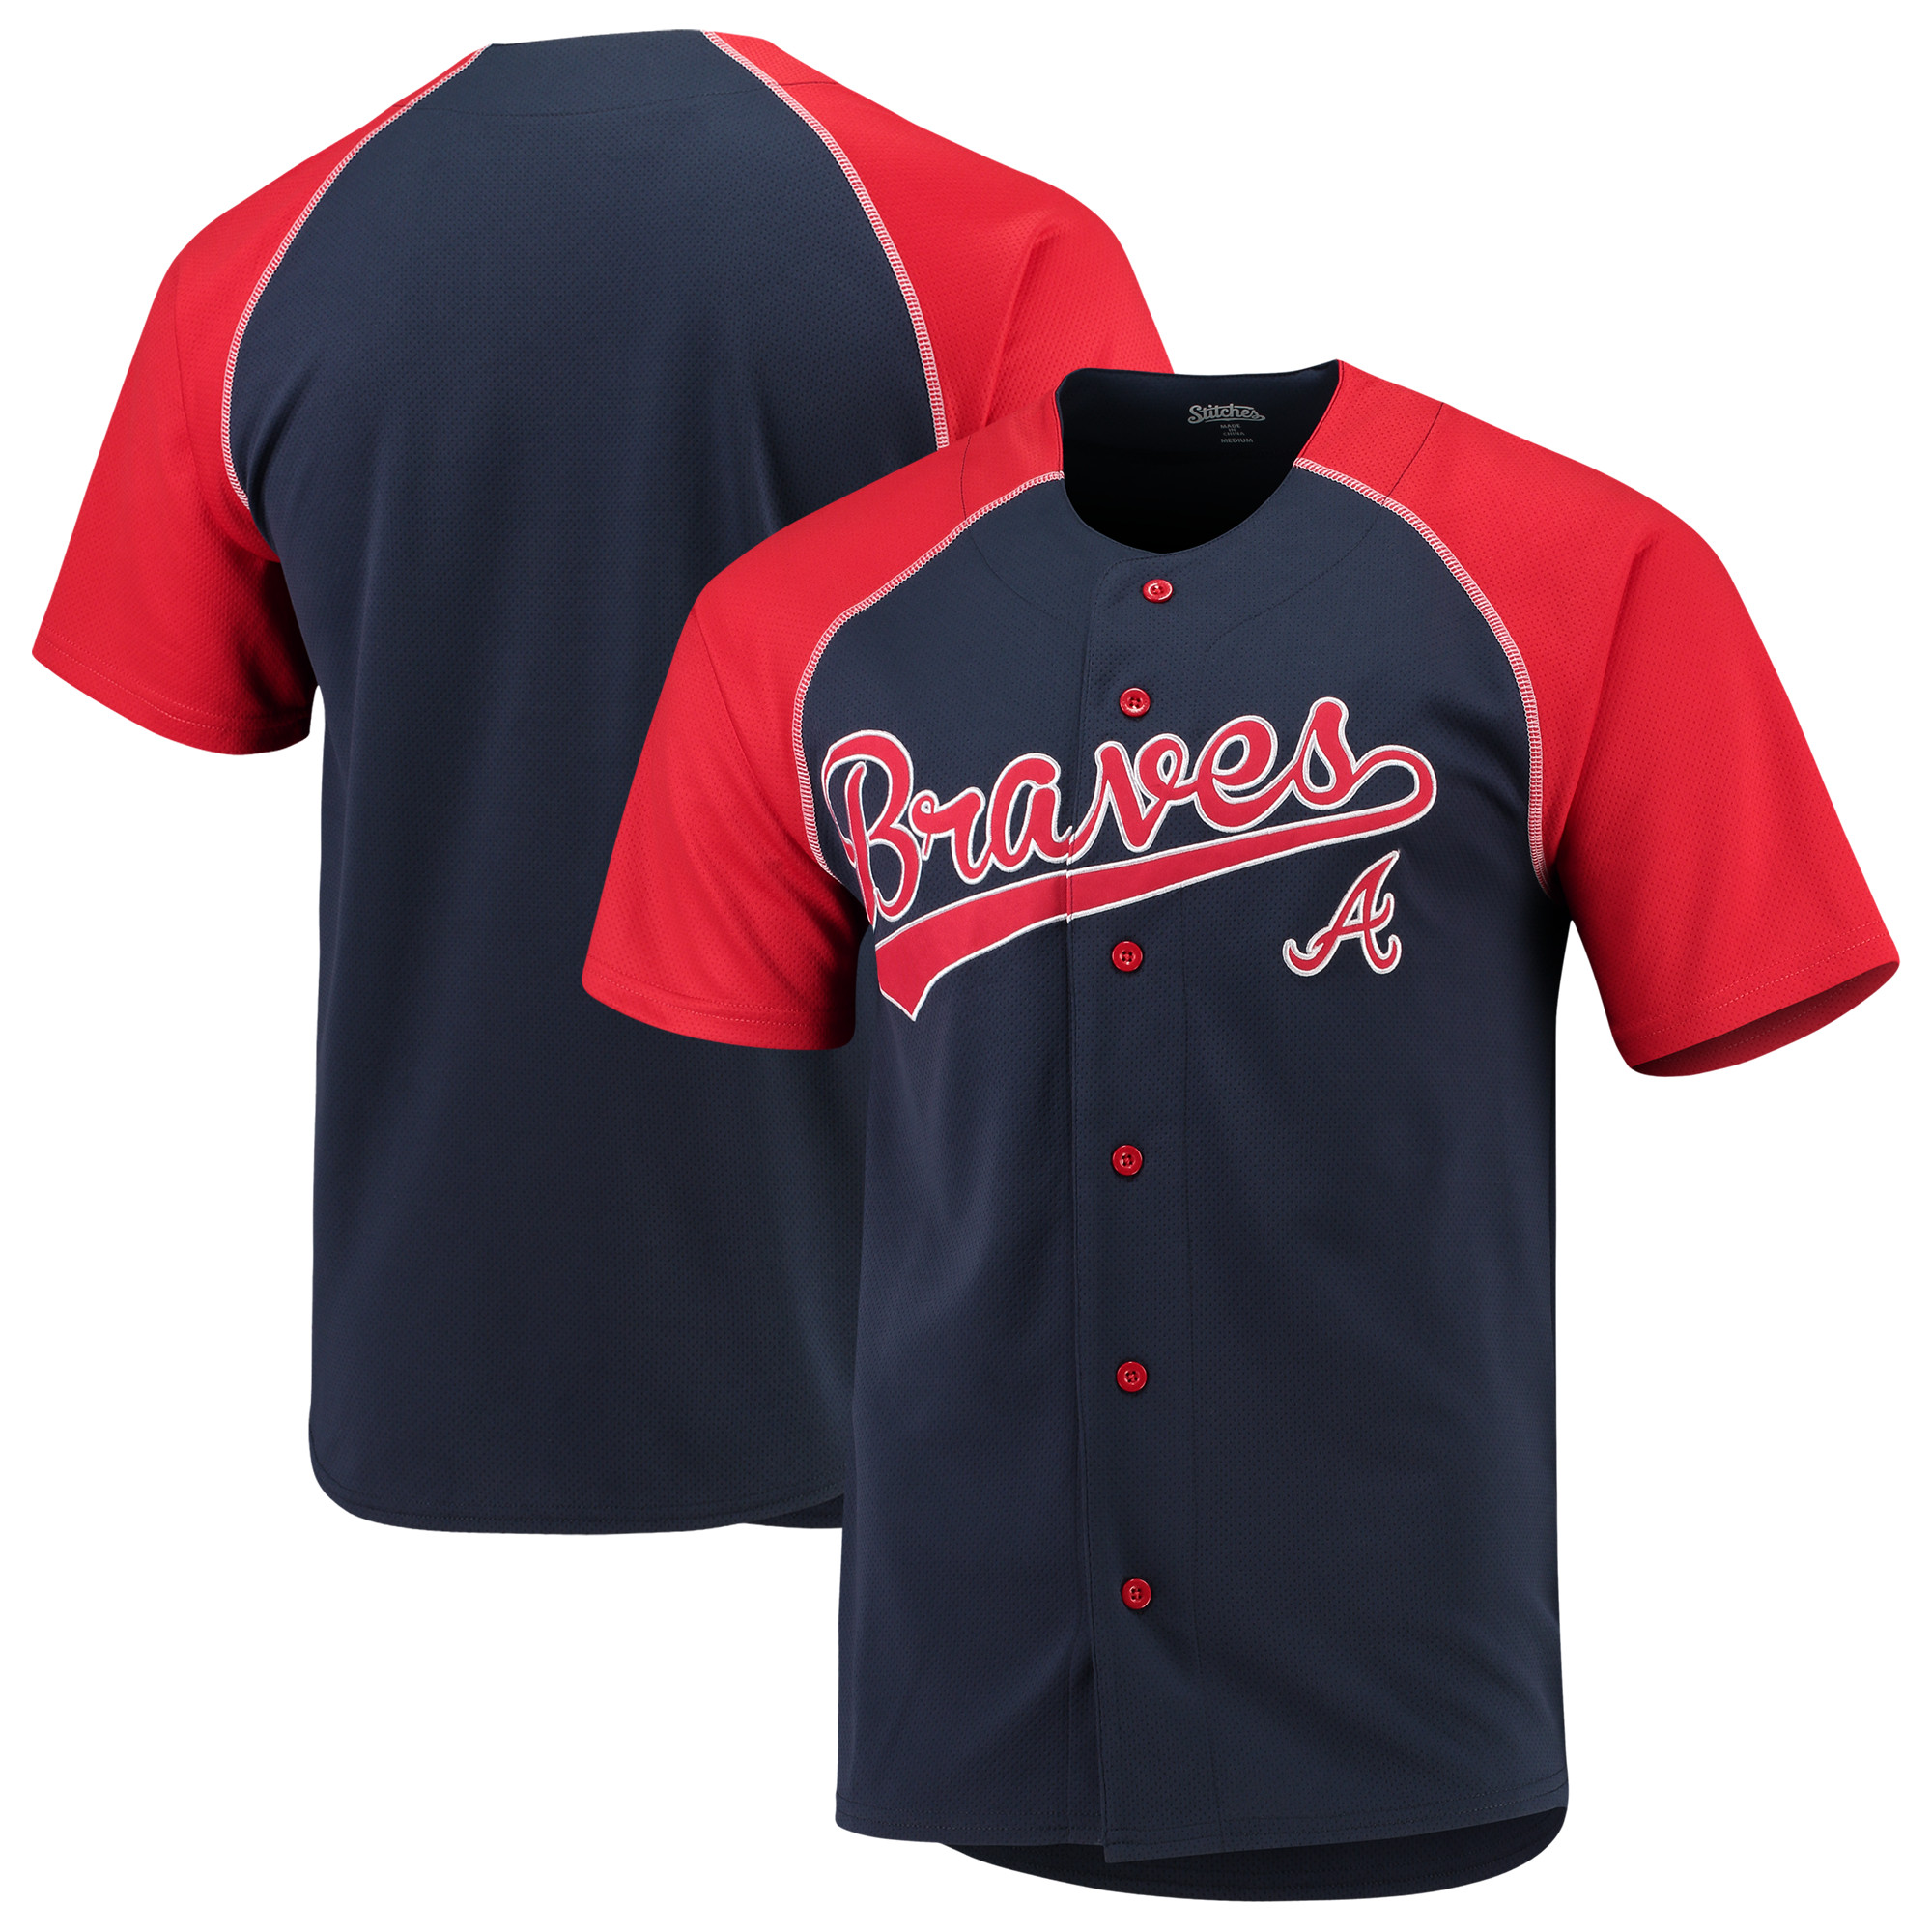 Atlanta Braves Stitches Team Jersey - Navy/Red